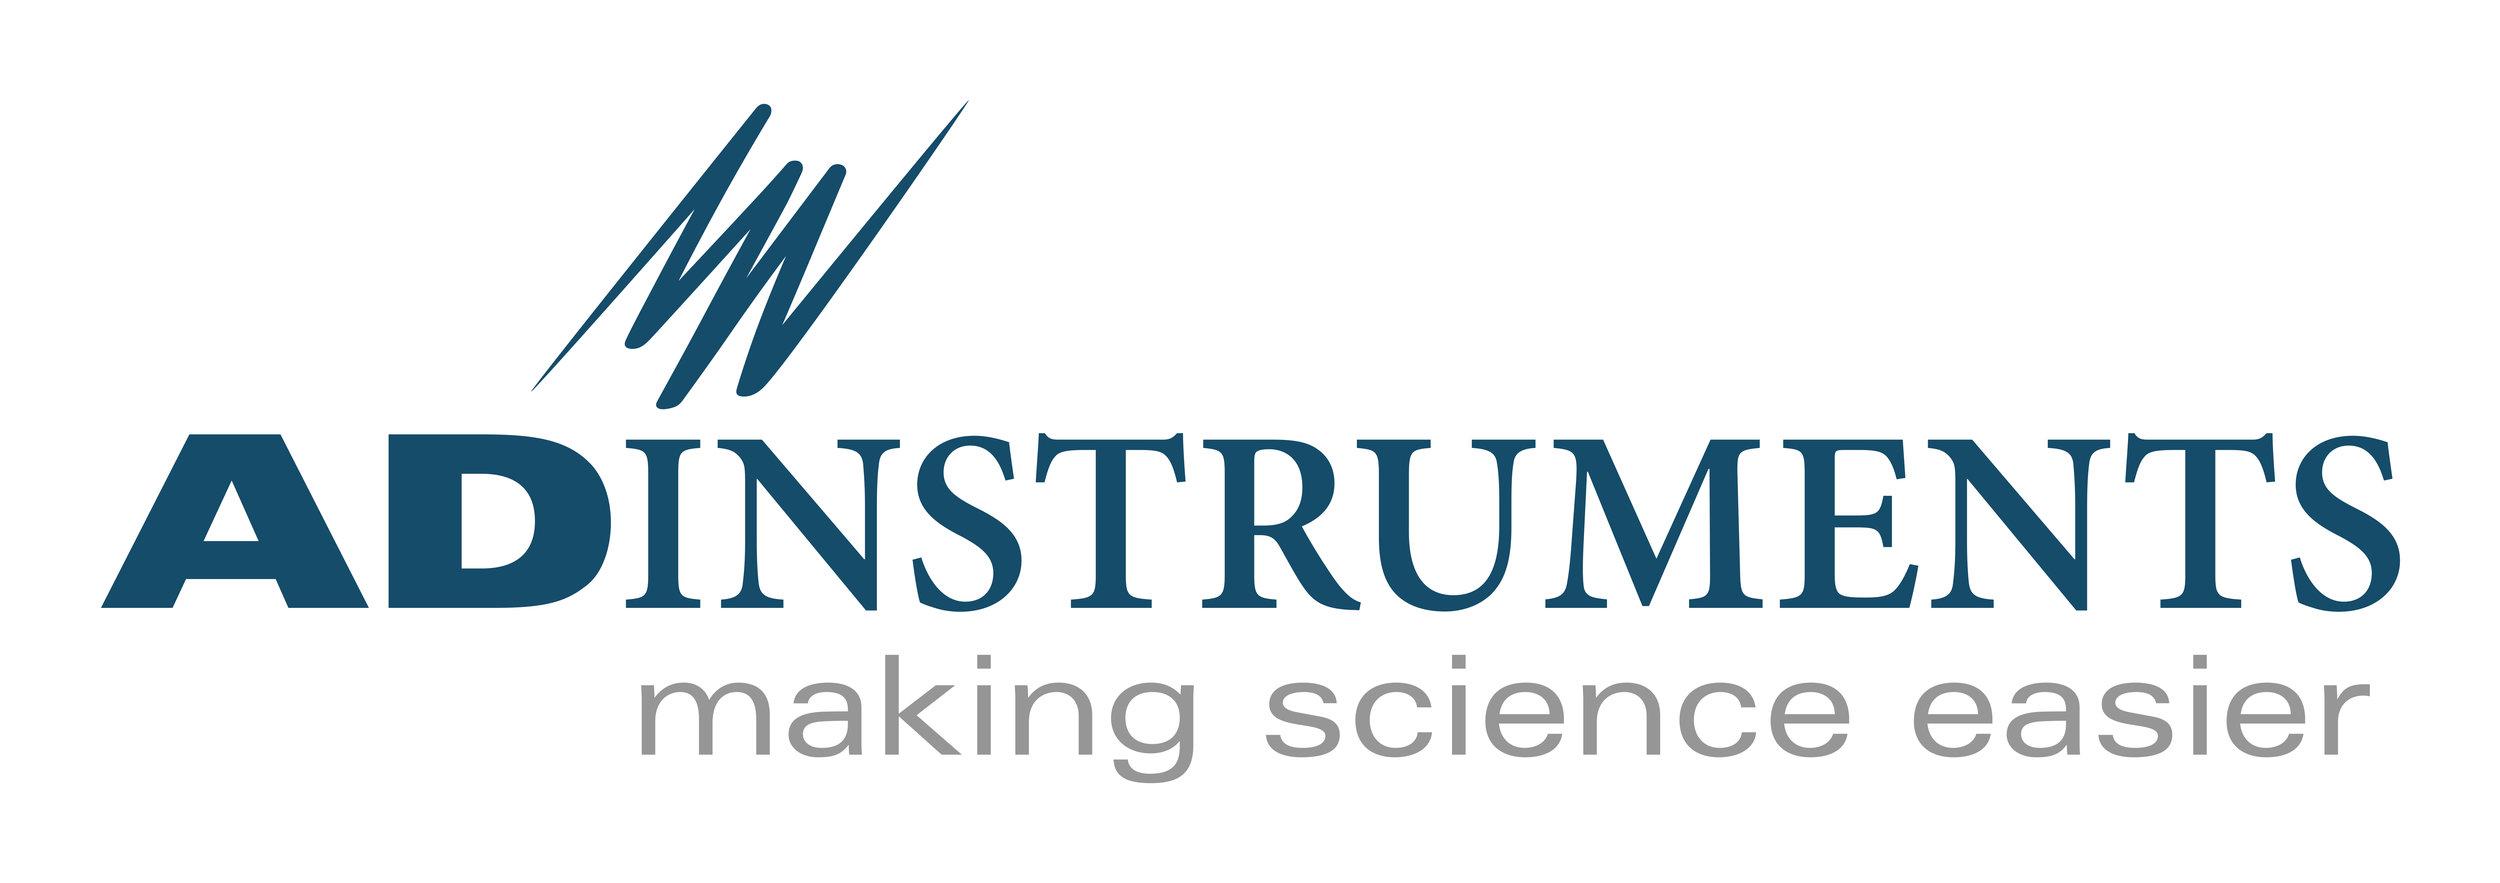 ADI Instruments